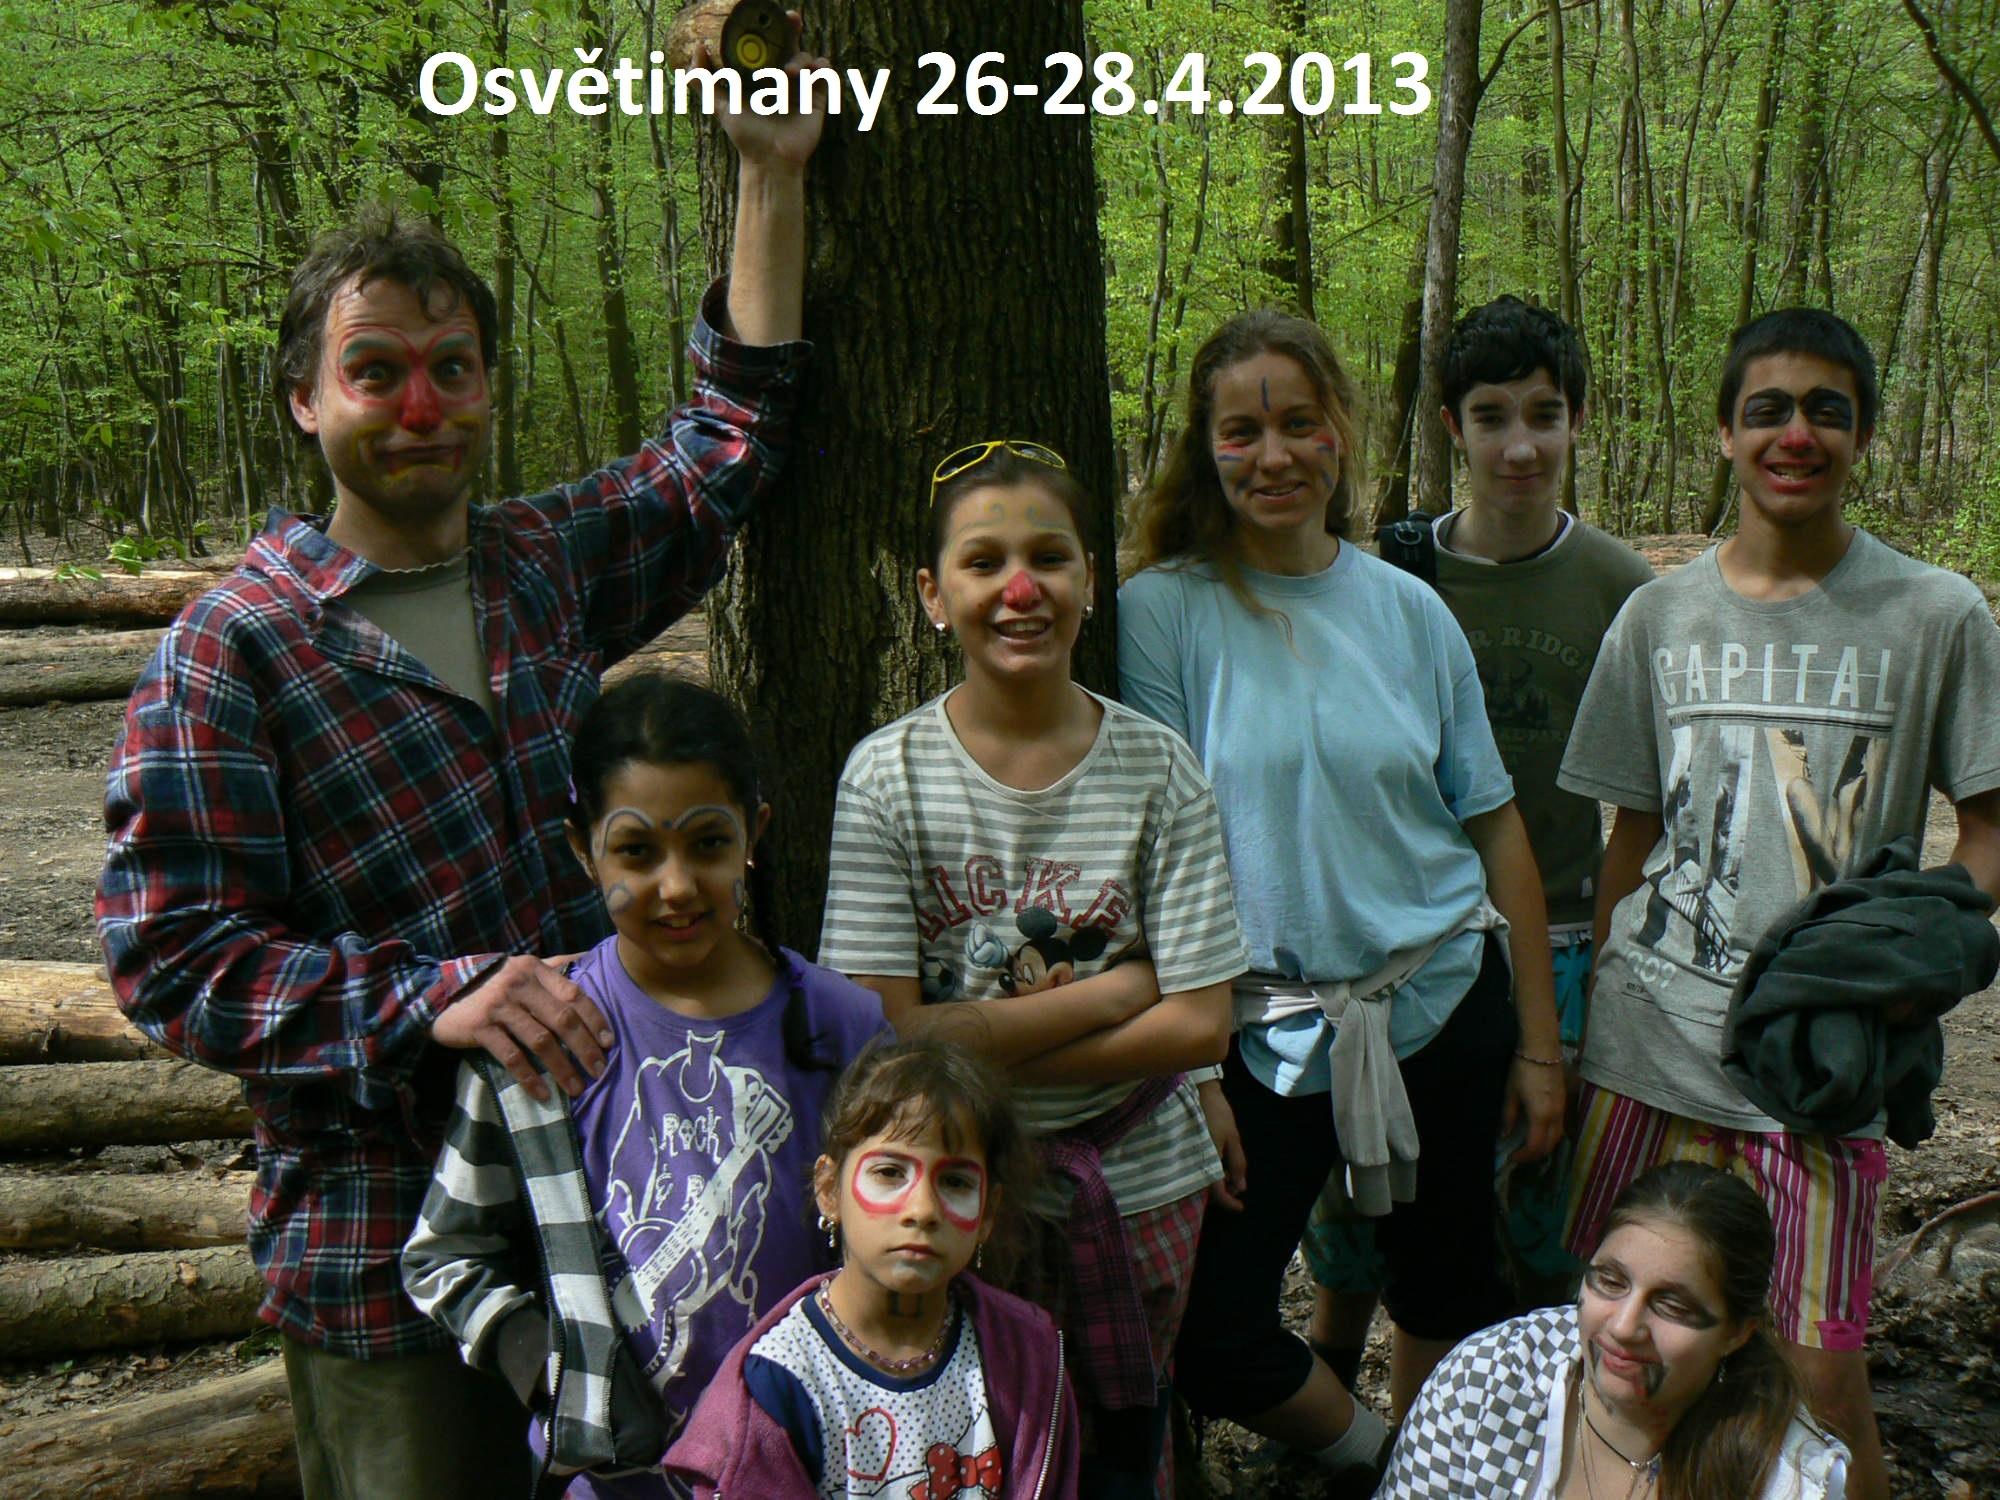 Osvetimany_4.2013